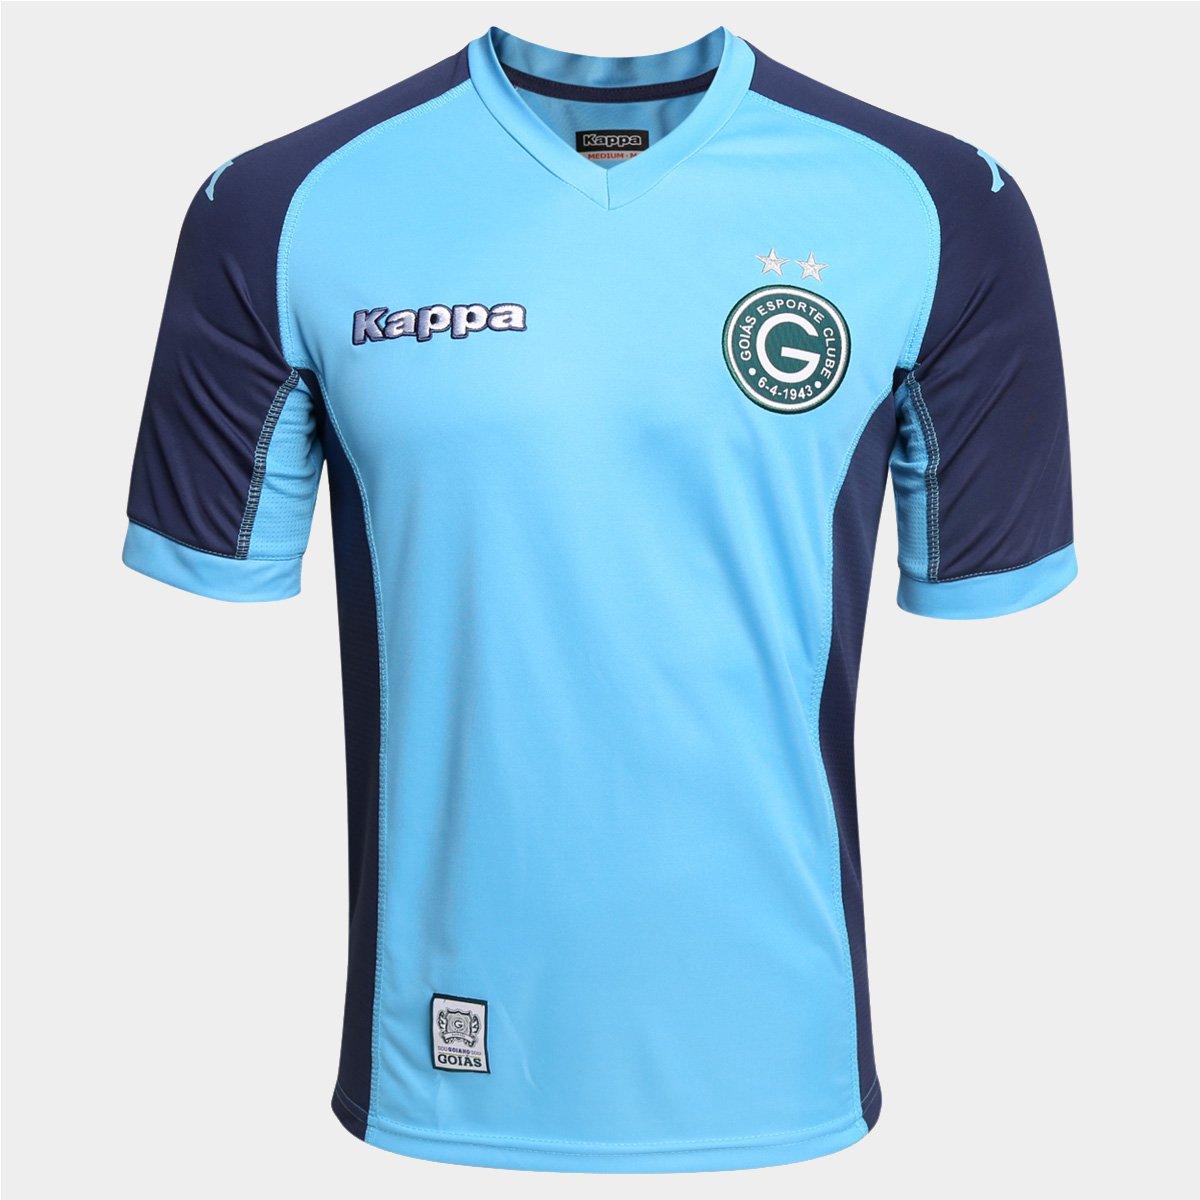 ad2626ae40 Camisa Goiás Goleiro 2015 s nº - Torcedor Kappa Masculina - Compre Agora